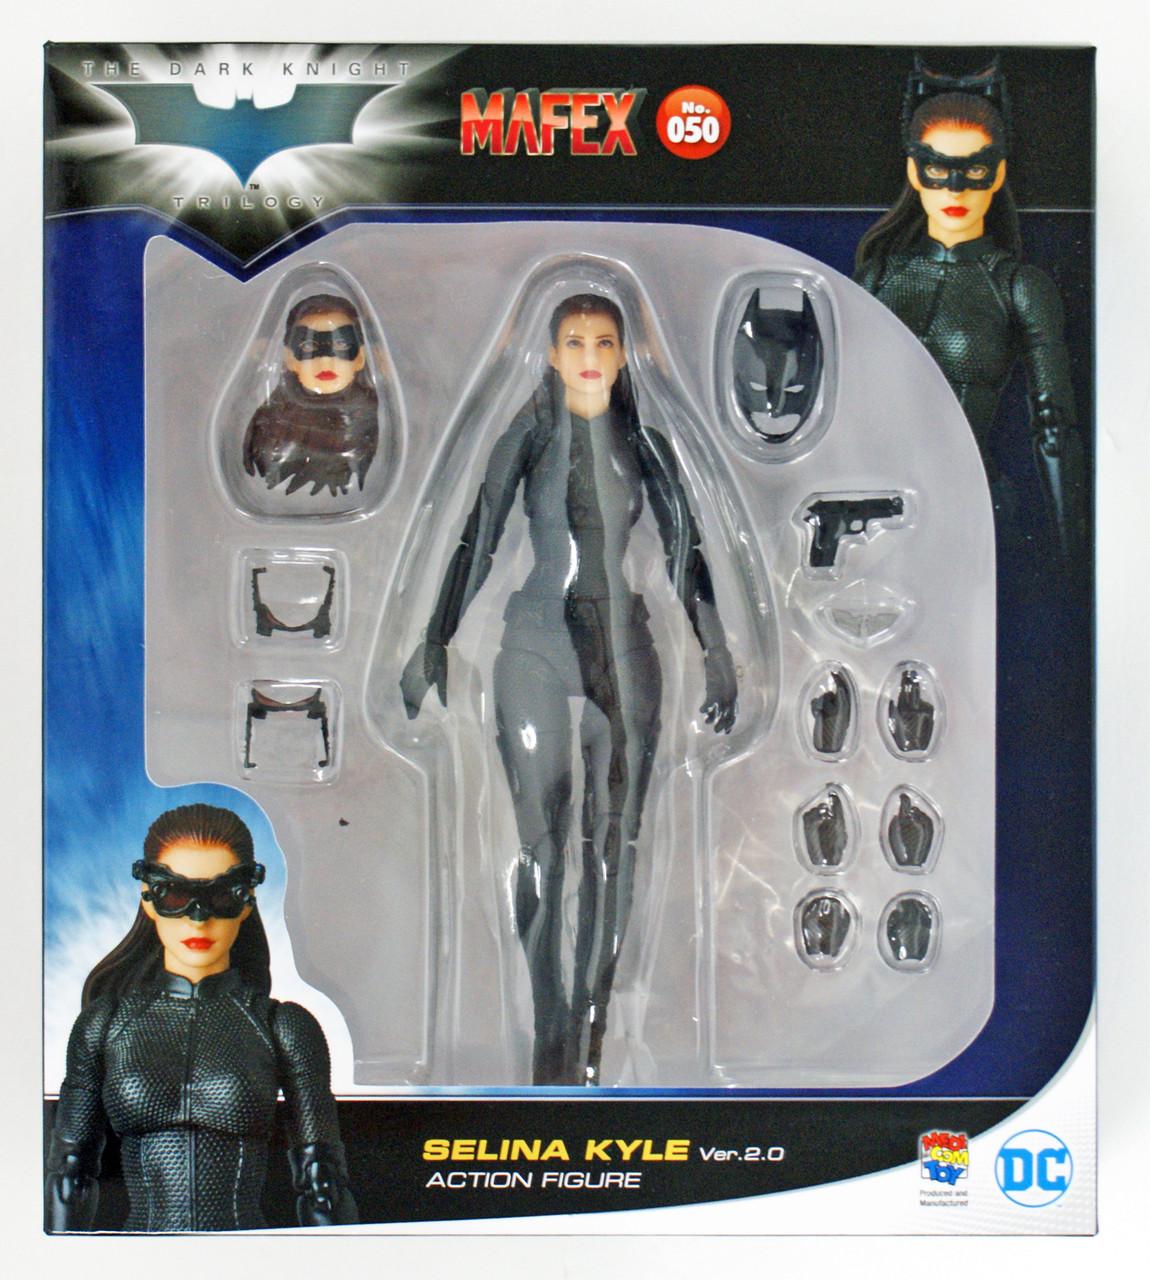 Batman Begins Scarecrow Action Figure Medicom MAFEX 059